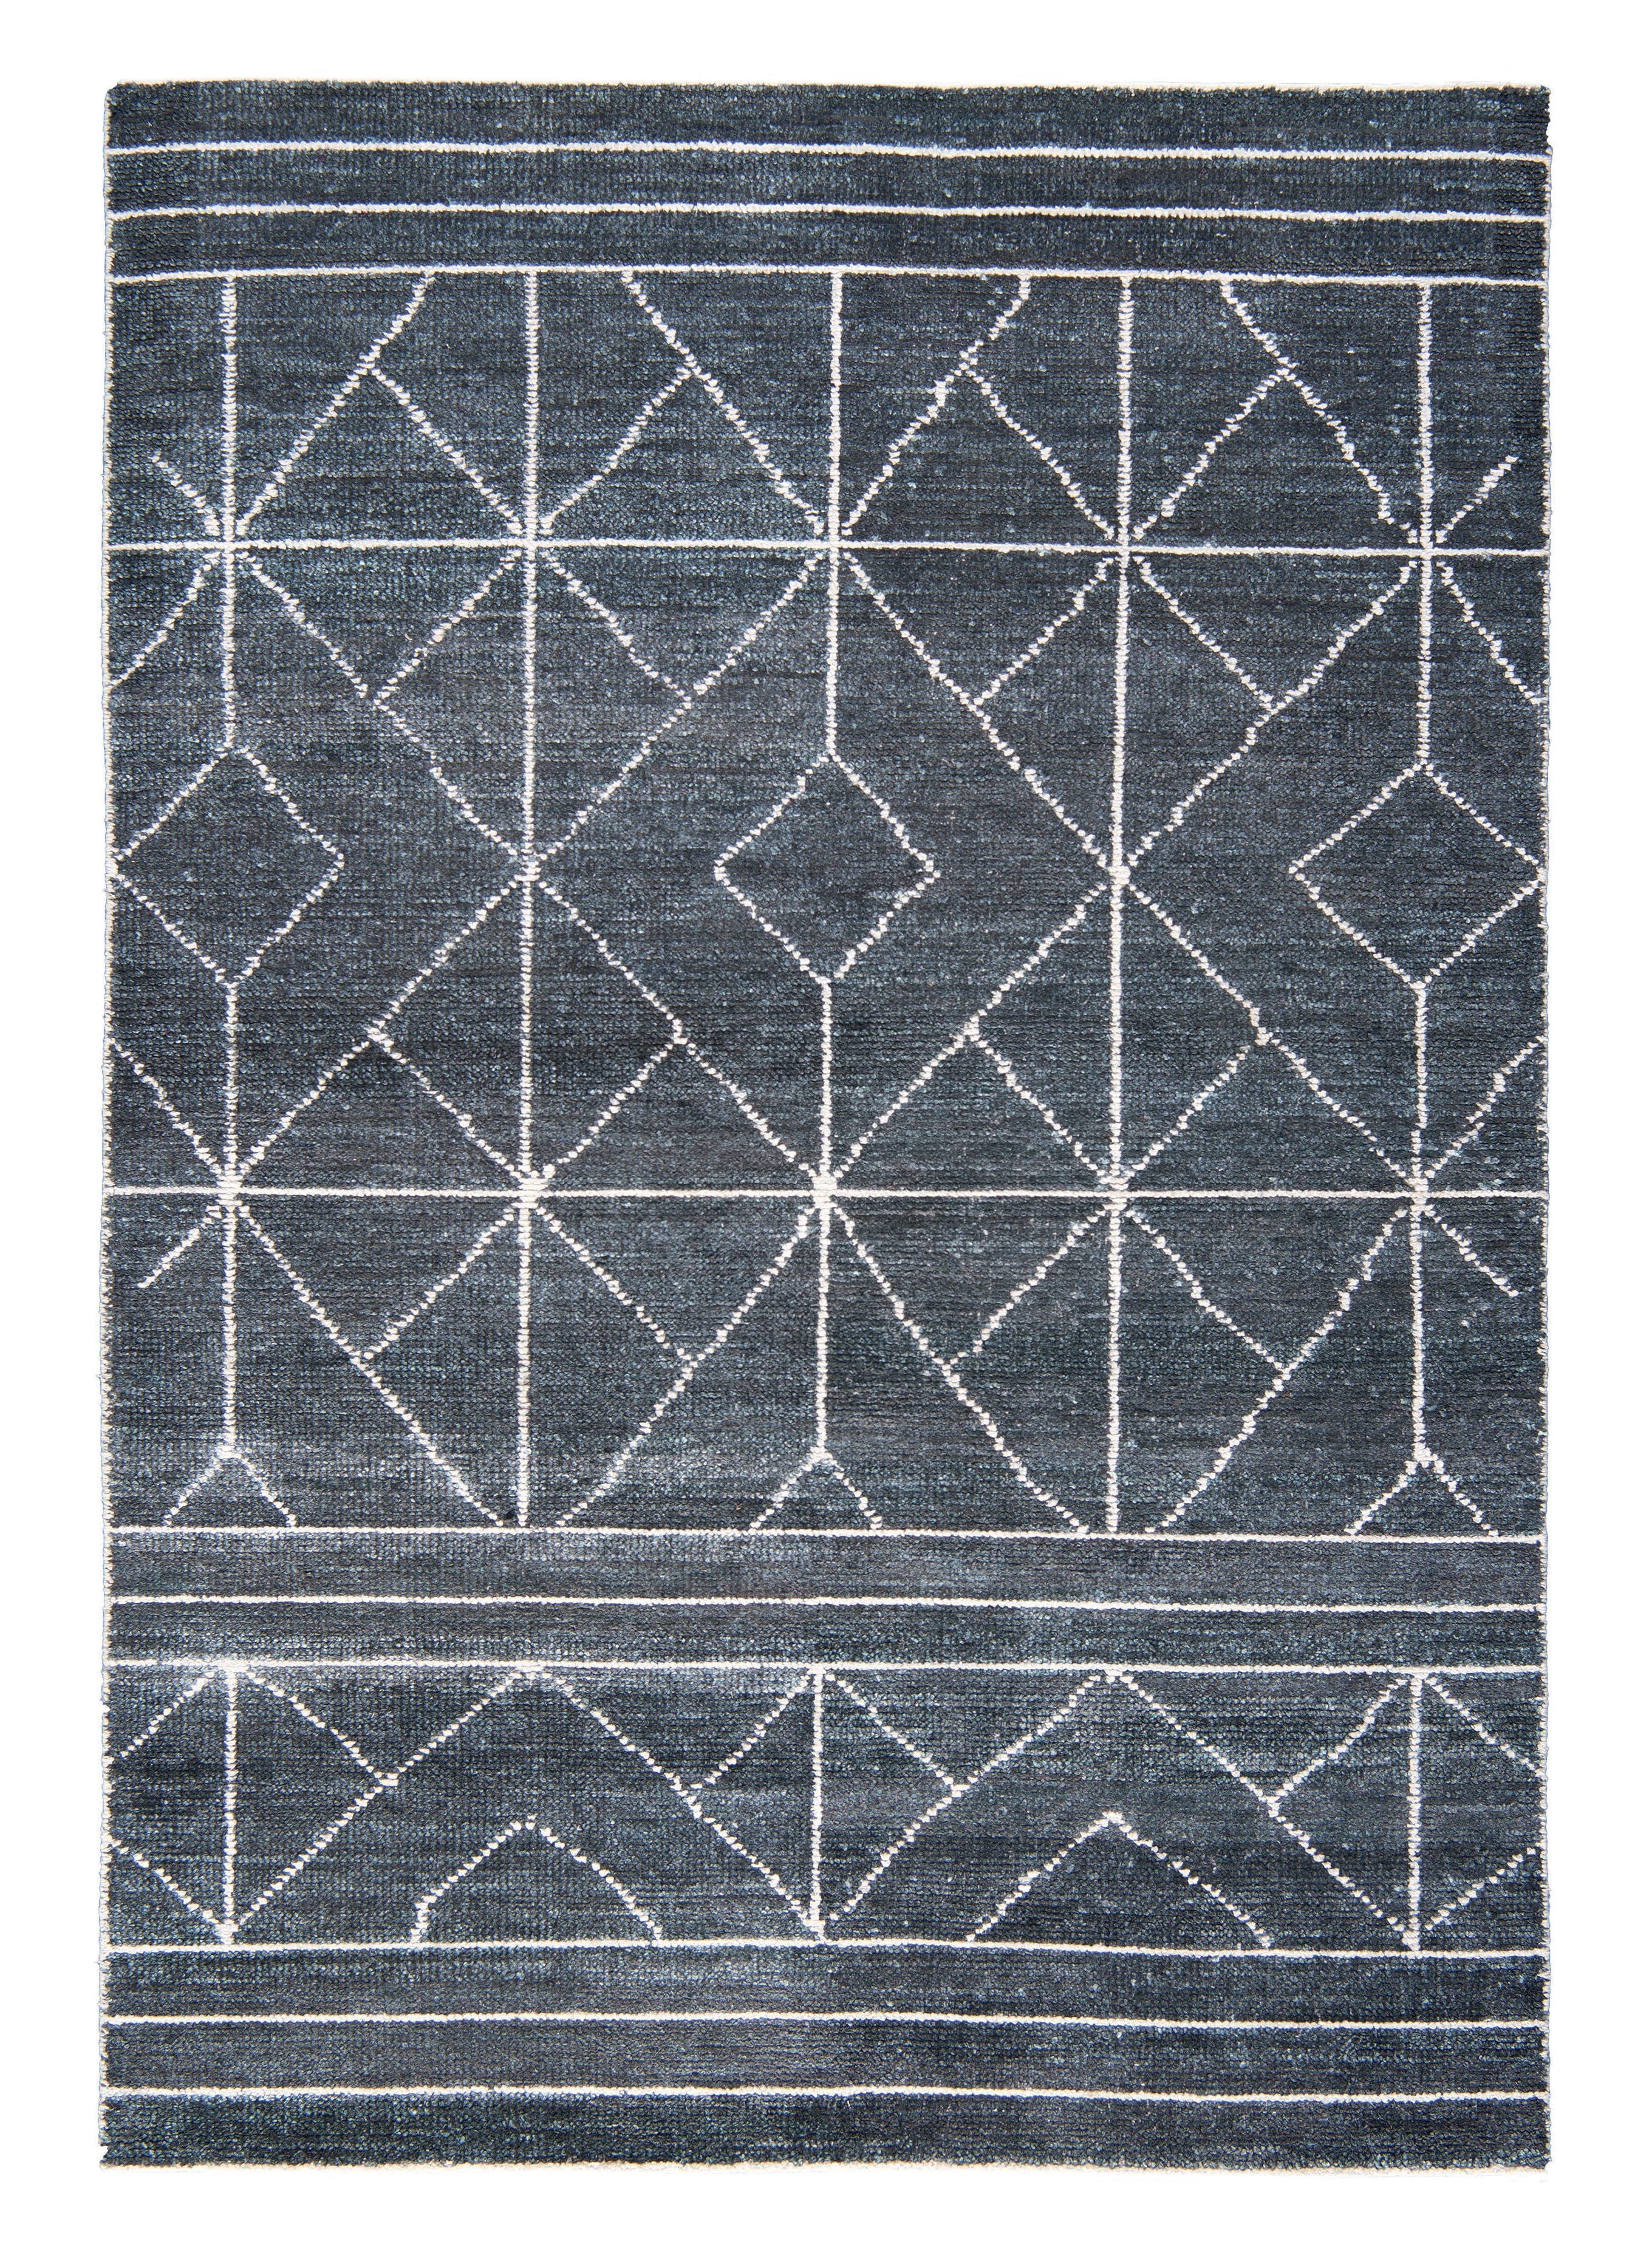 Decoration - Rugs - Casbah Rug - 170 x 240 cm by Toulemonde Bochart - Greu / White patterns - Cotton, Viscose